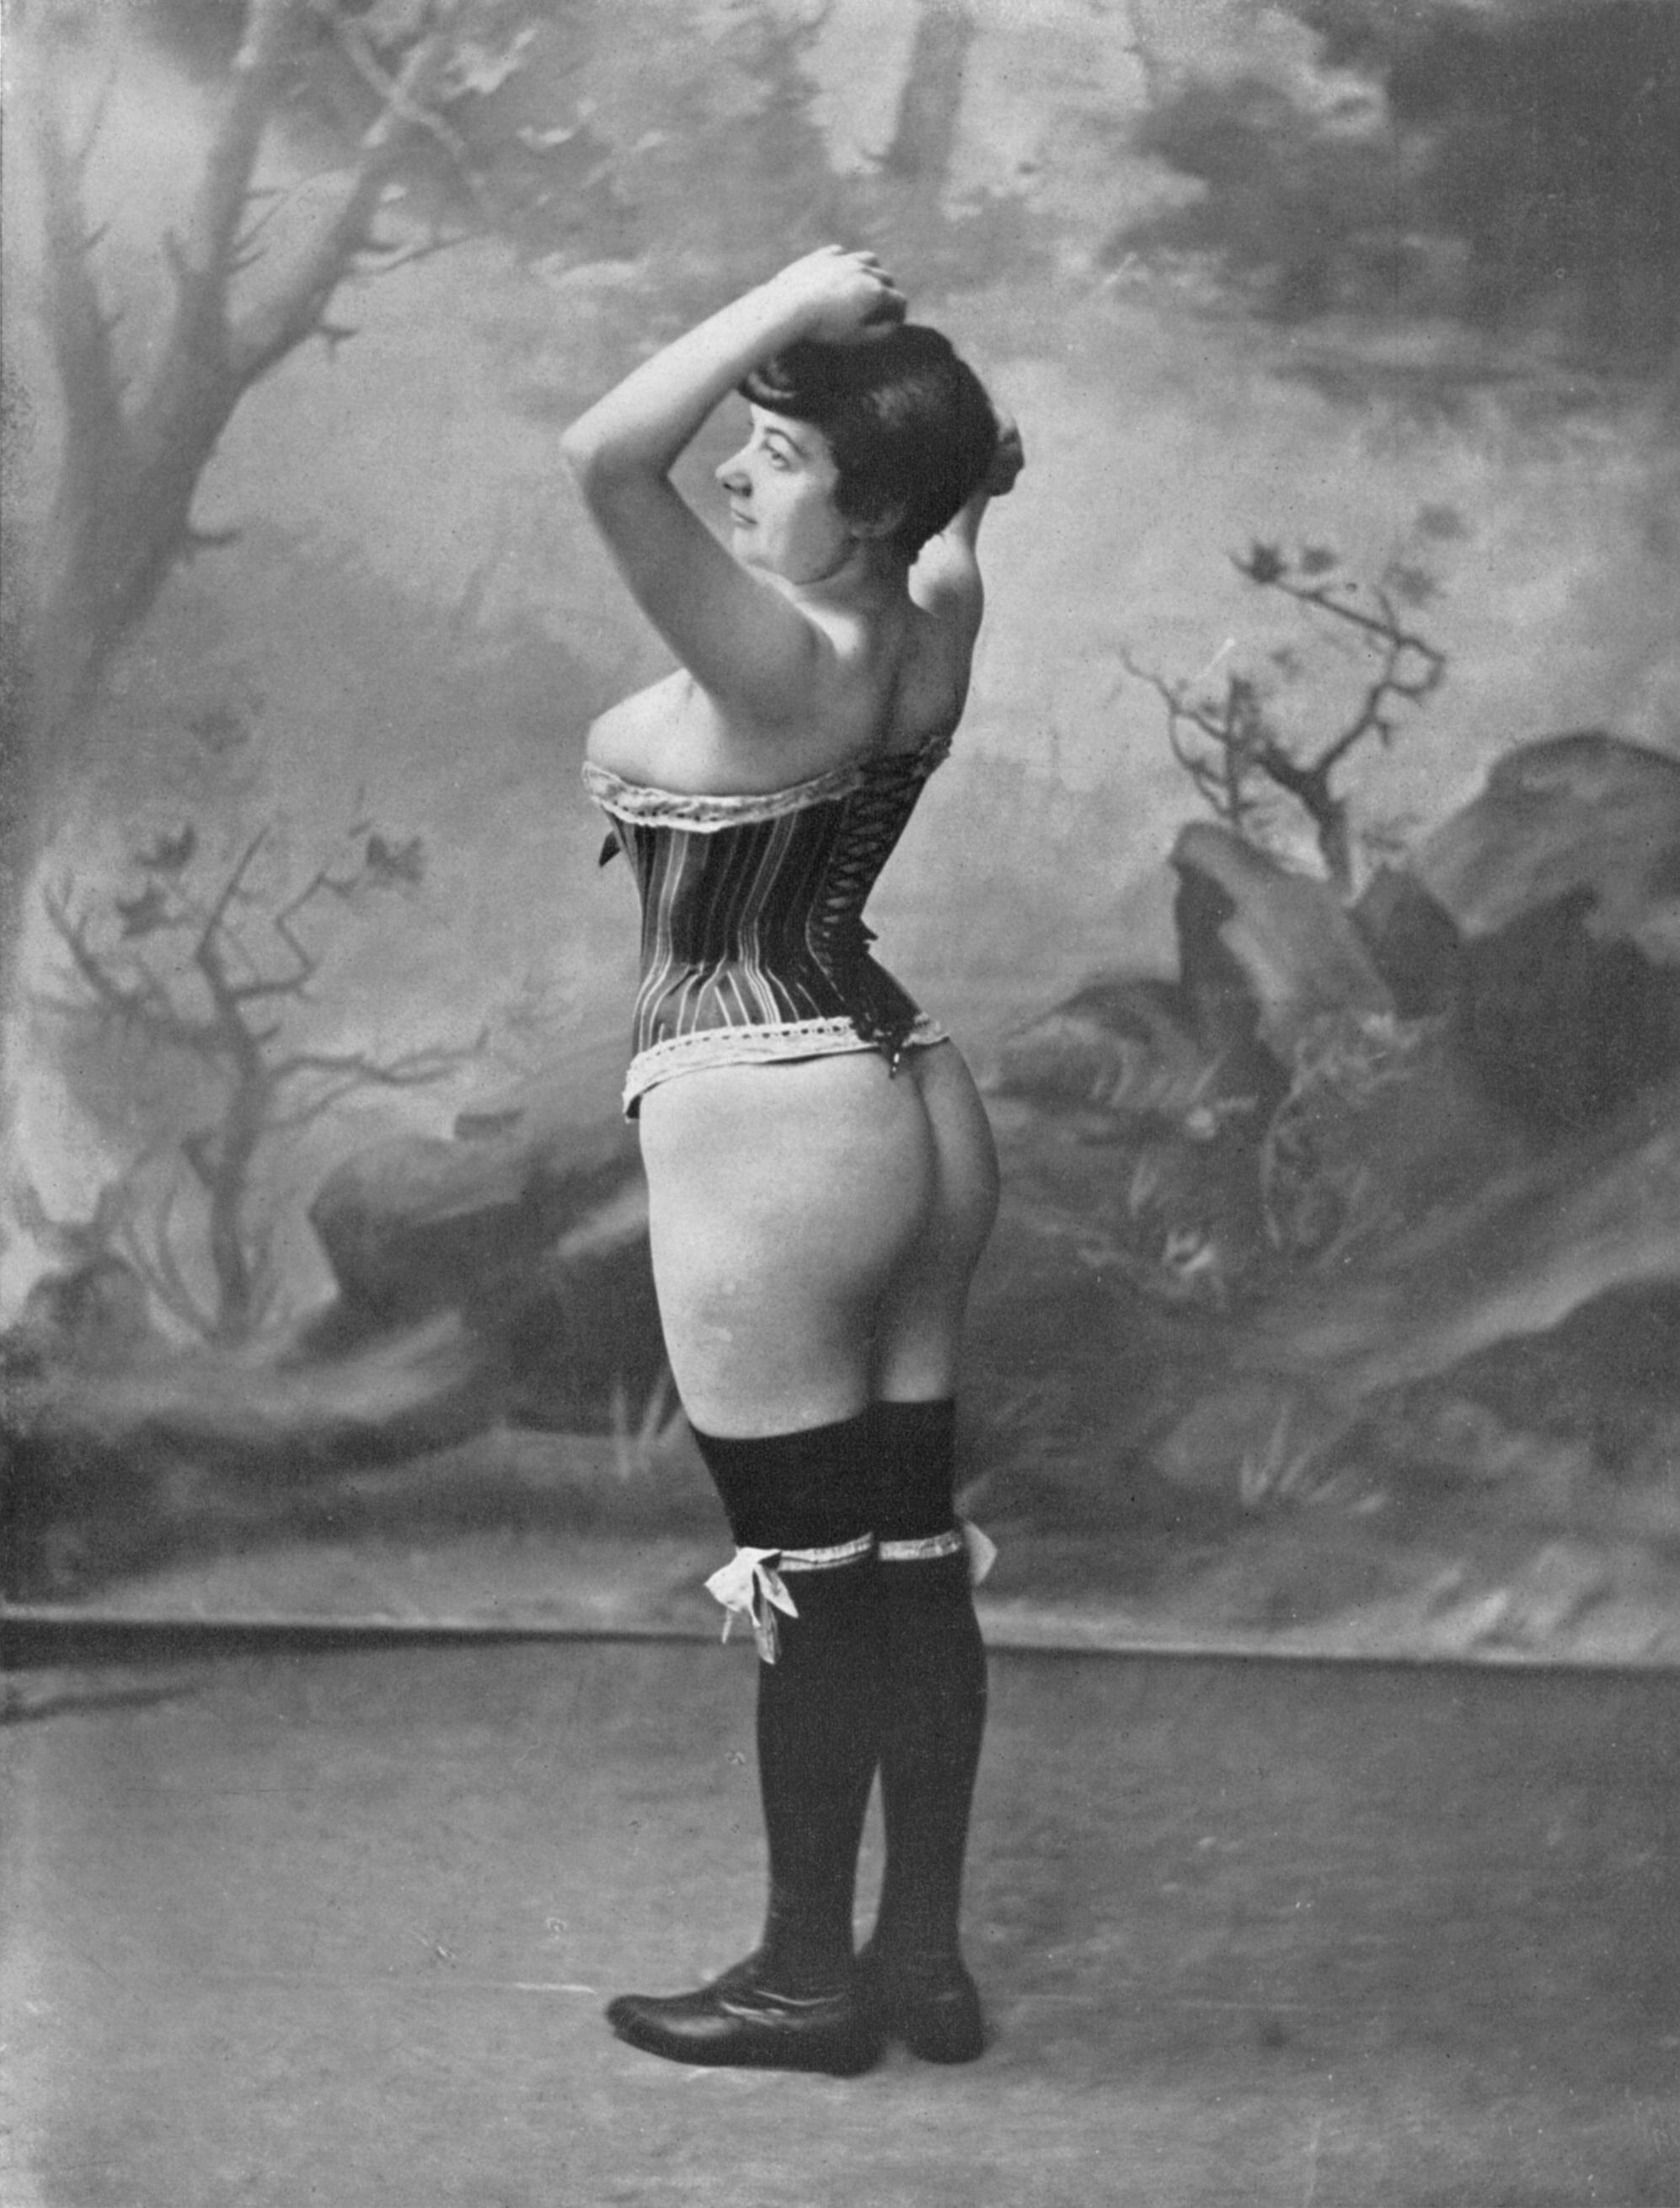 File:Corset paris 1902.jpg